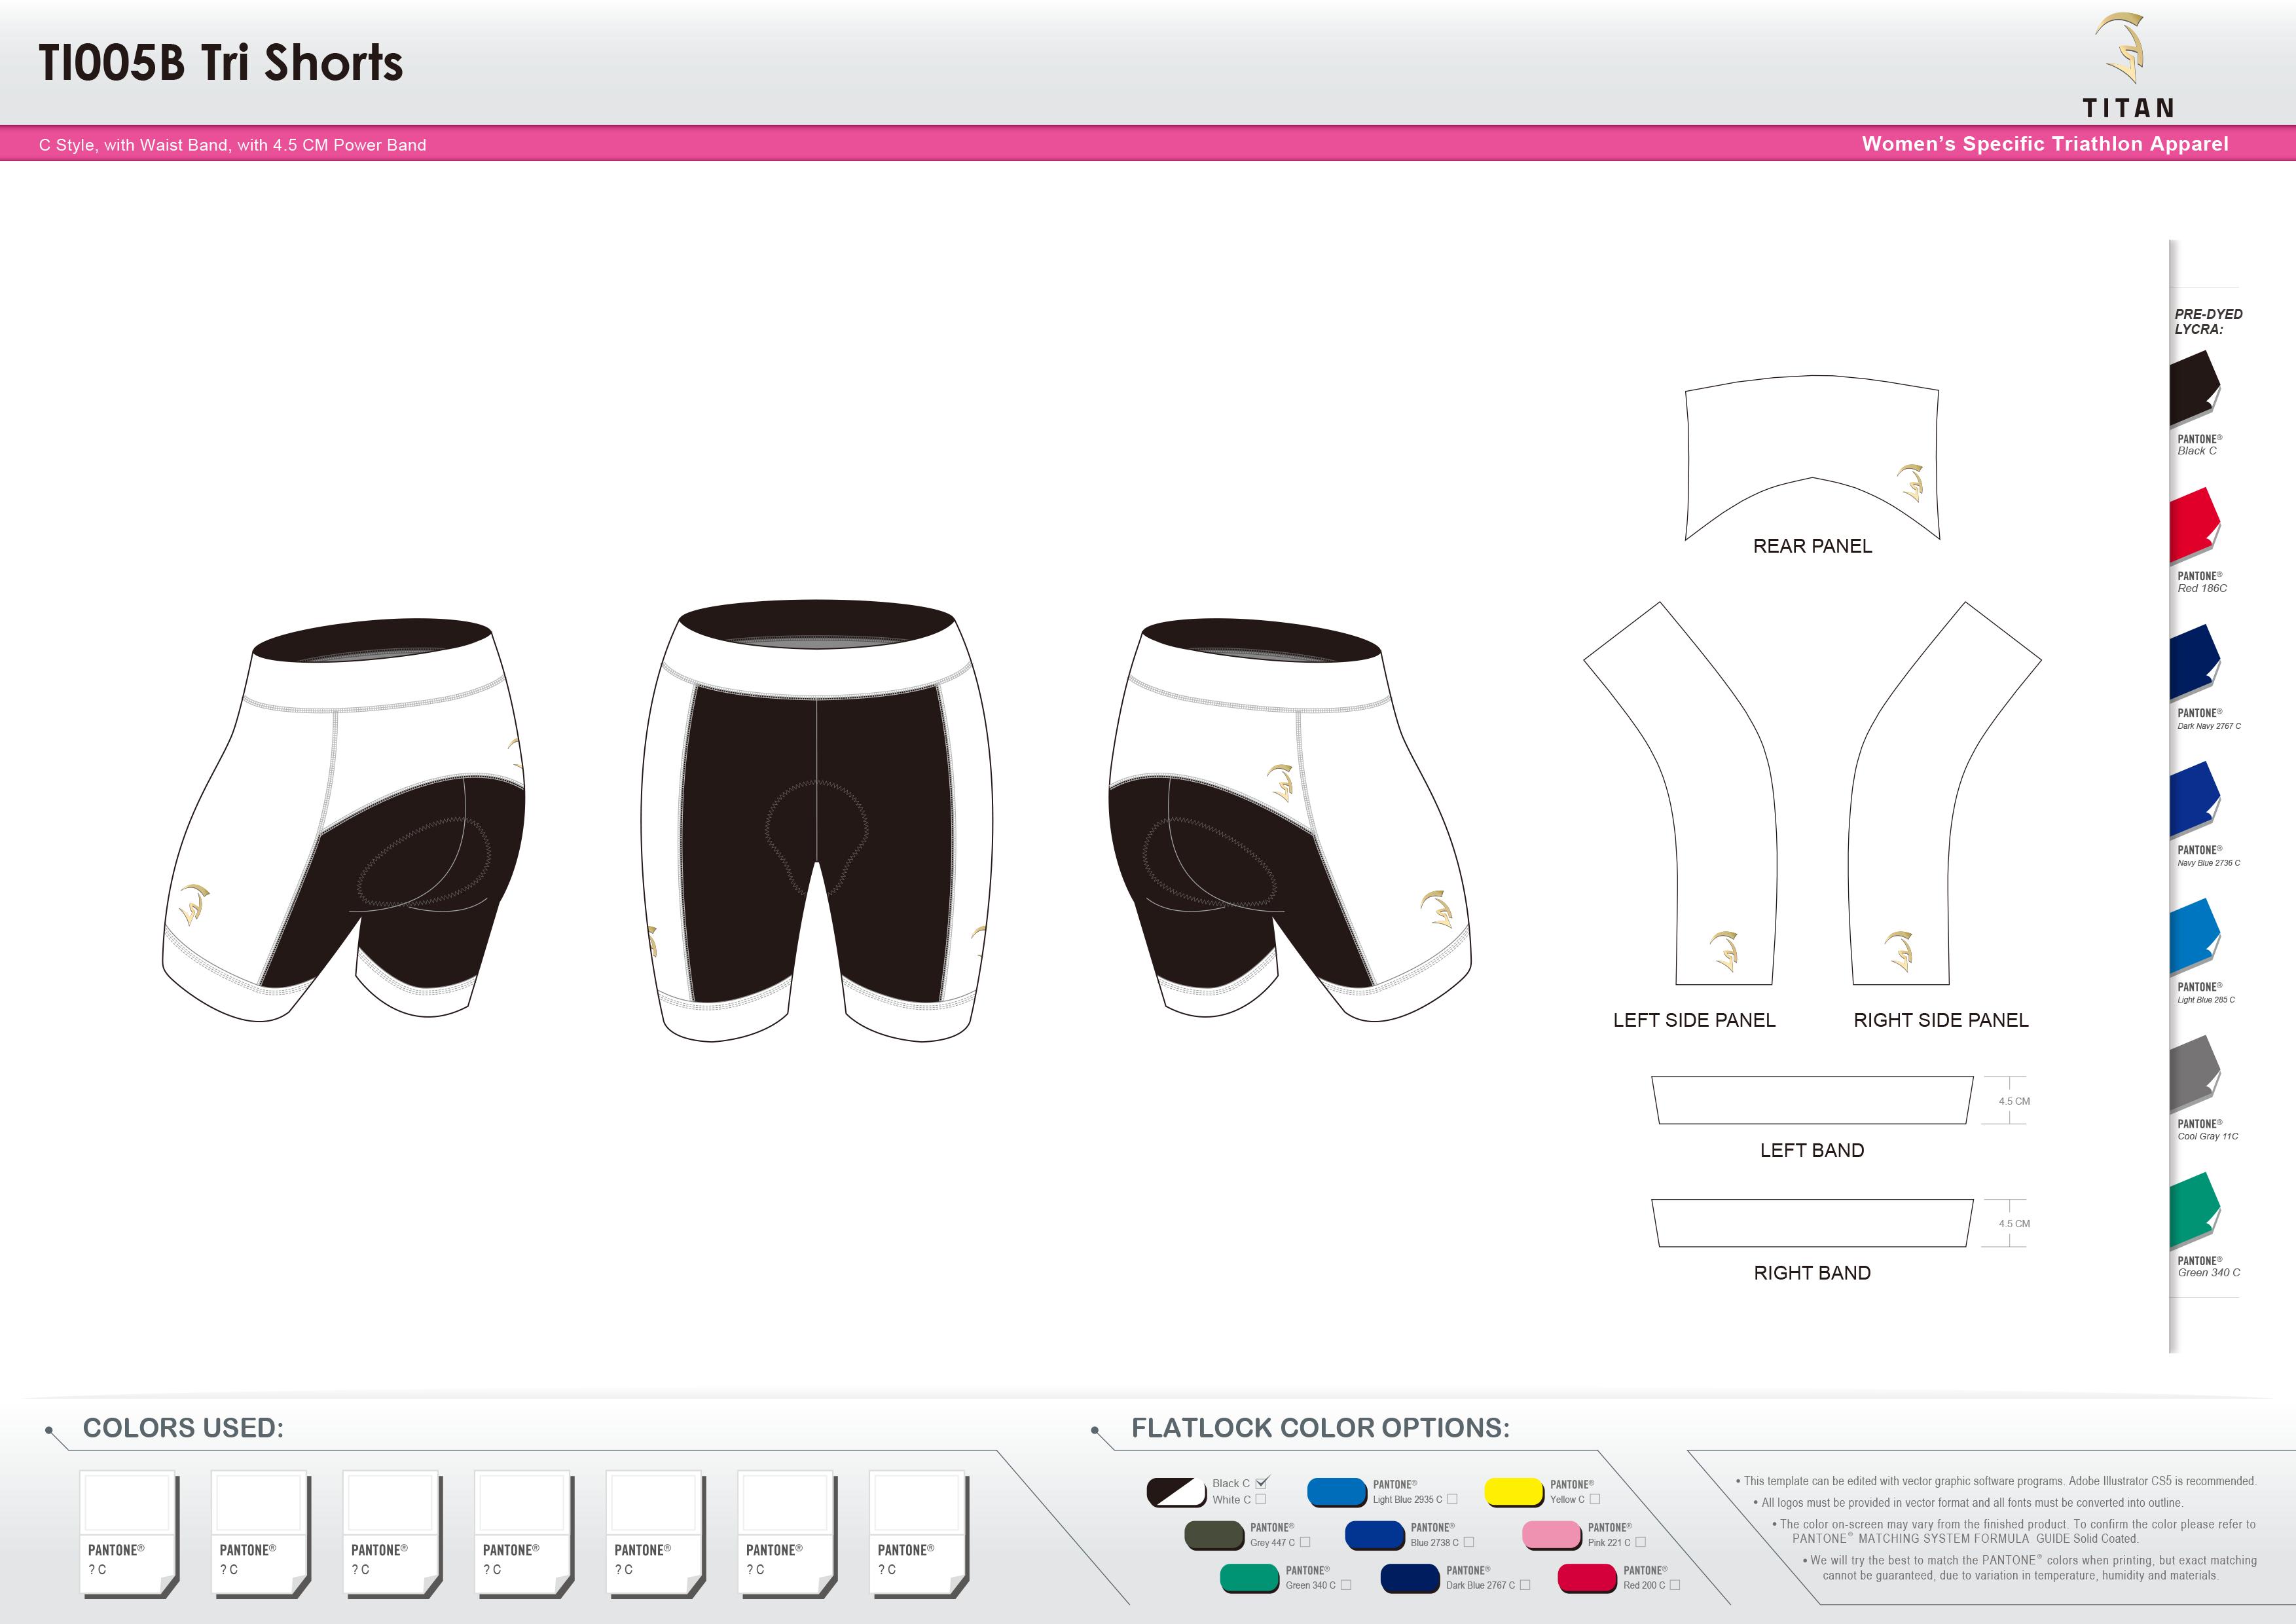 TI005B Women's Tri Shorts